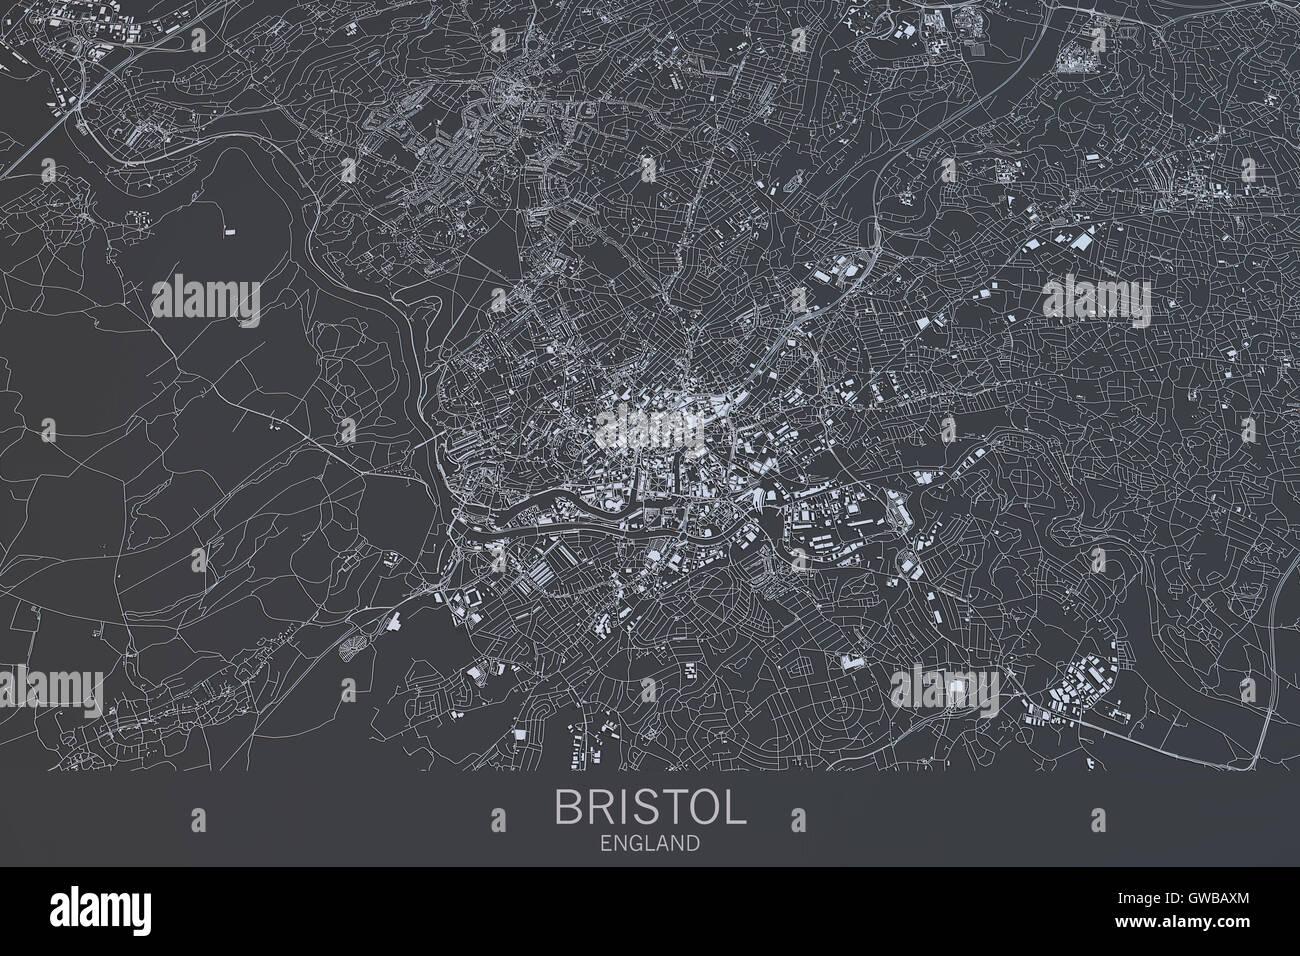 Bristol map satellite view city England 3d